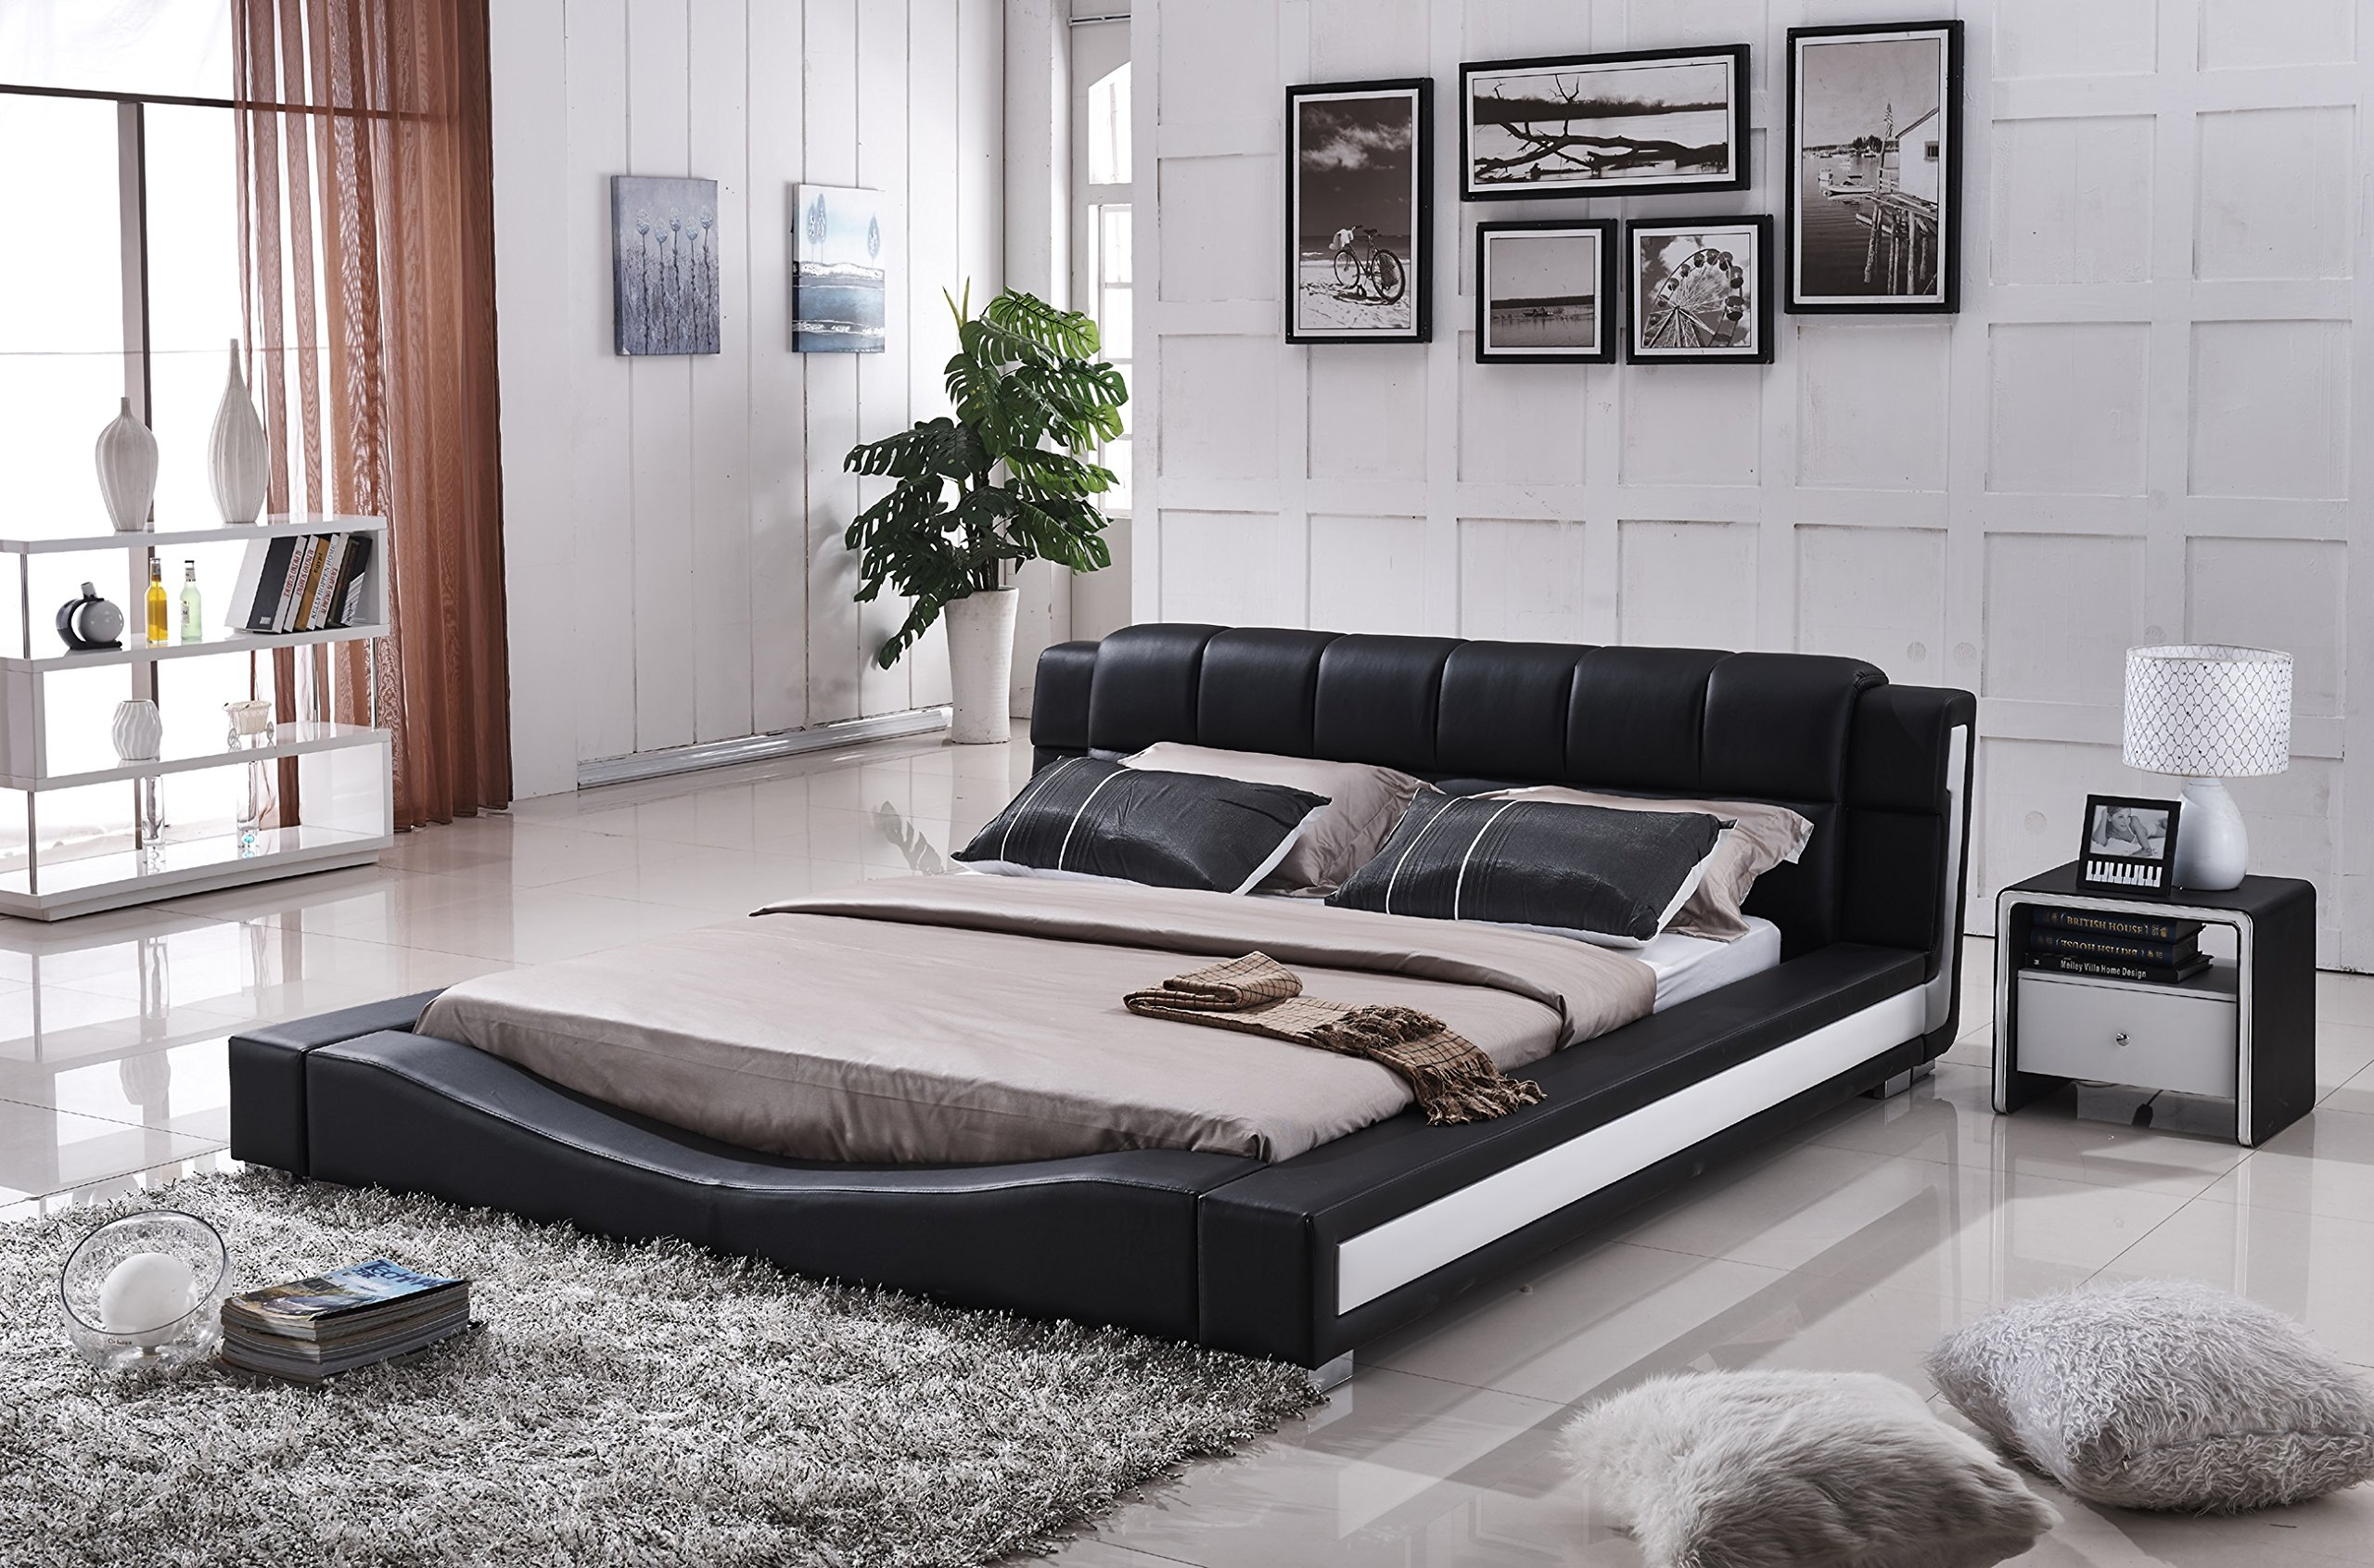 US Pride Furniture Pride Furniture Platform Bed, California king, Black/White by US Pride Furniture